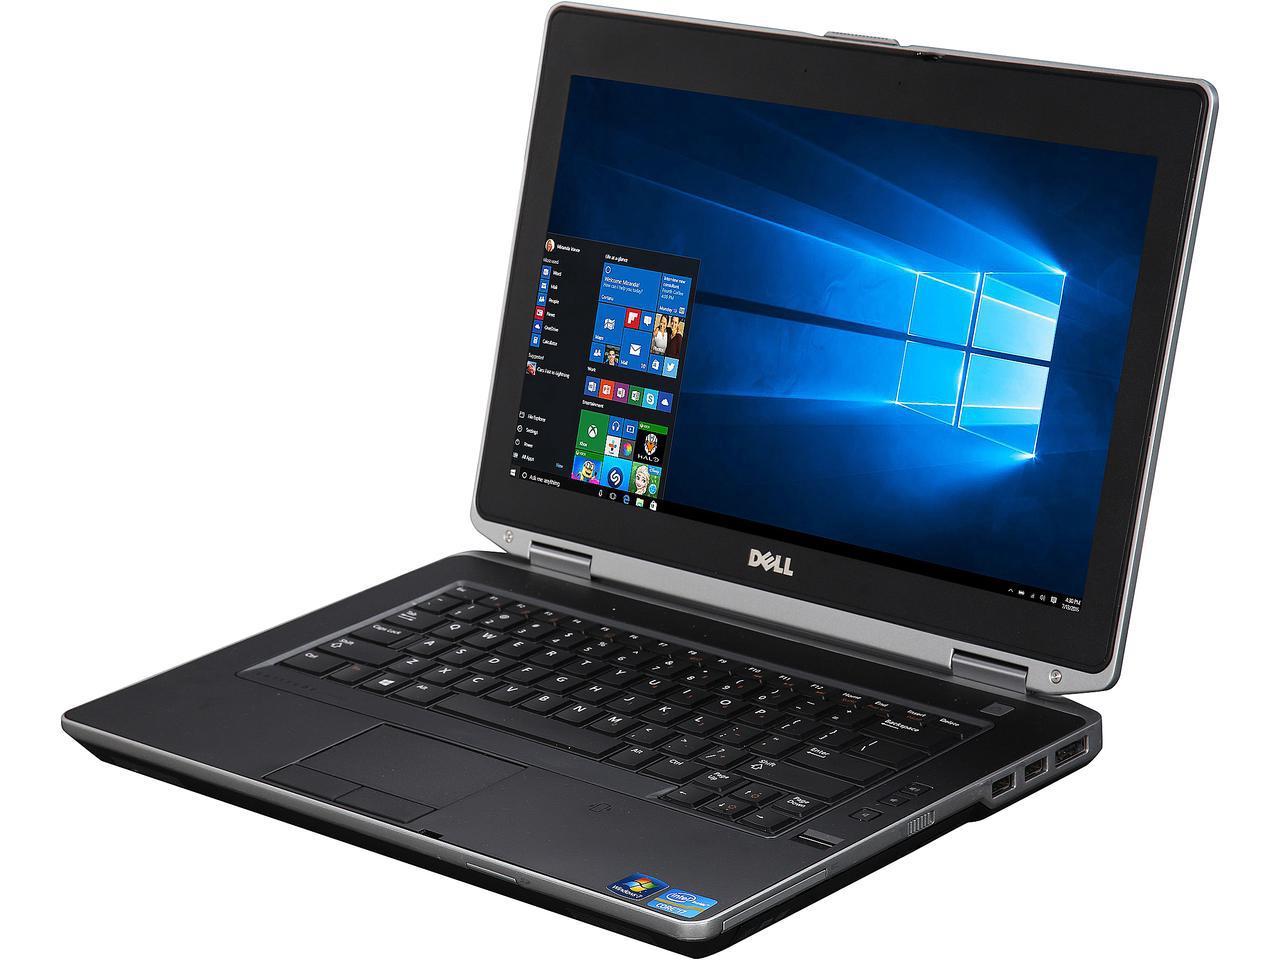 Nettradez: Lenovo Thinkpad T410 Intel i5 2 5Ghz 4GB / 500GB